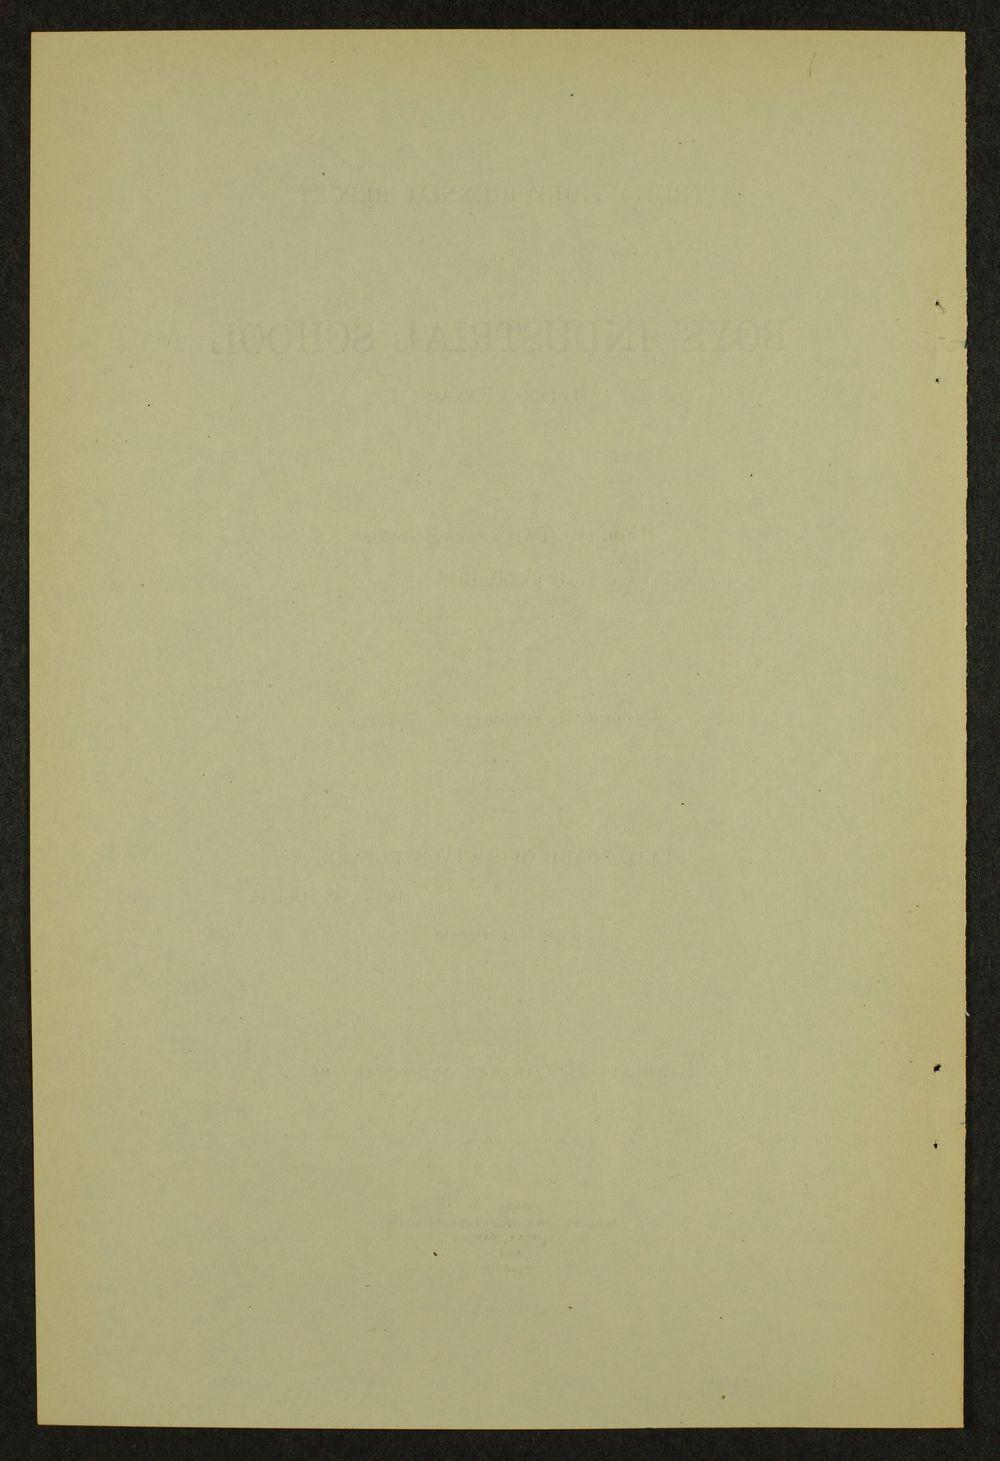 Biennial report of the Boys Industrial School, 1946 - 4